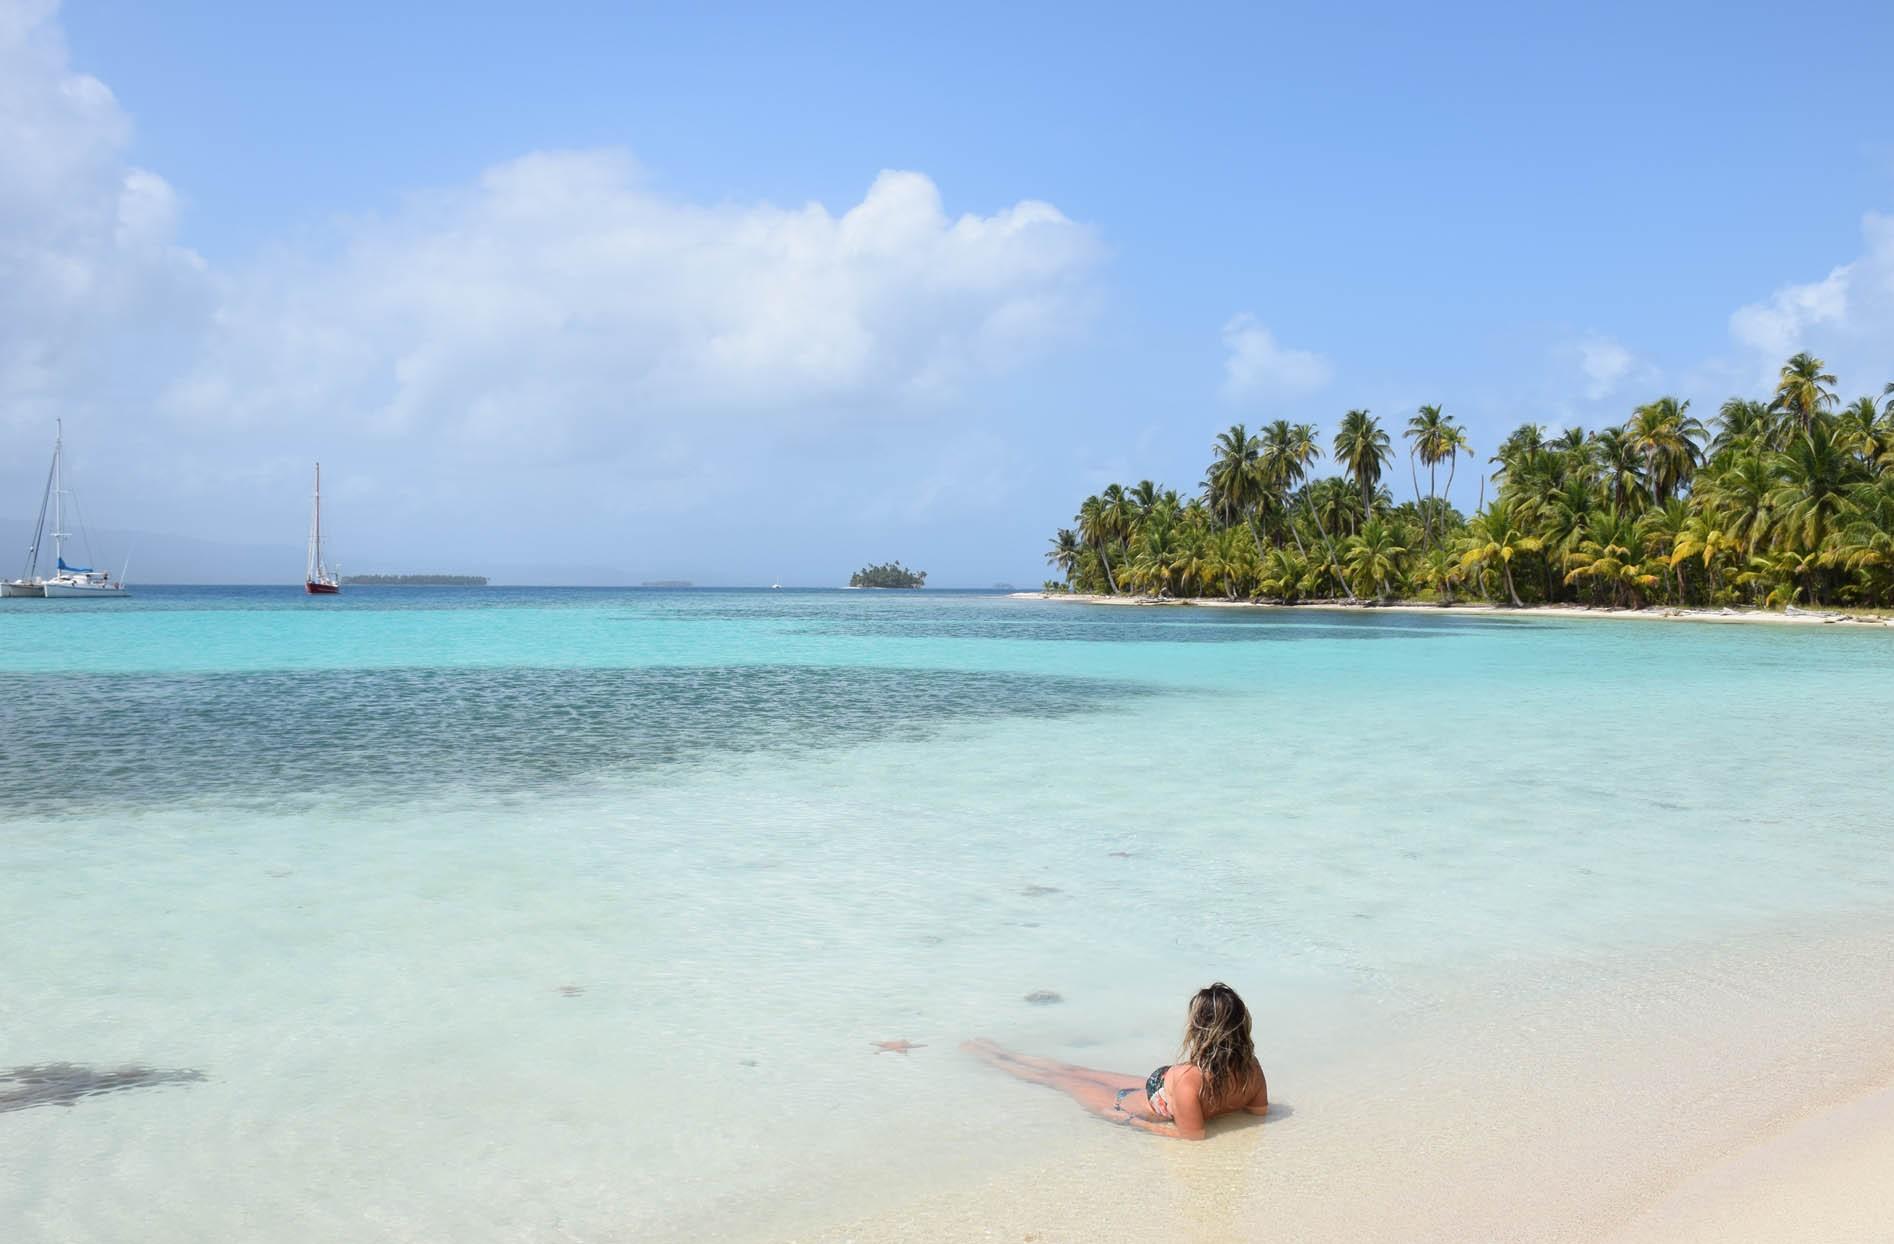 Salardup - Isla Estrellas - San Blas - Panamá